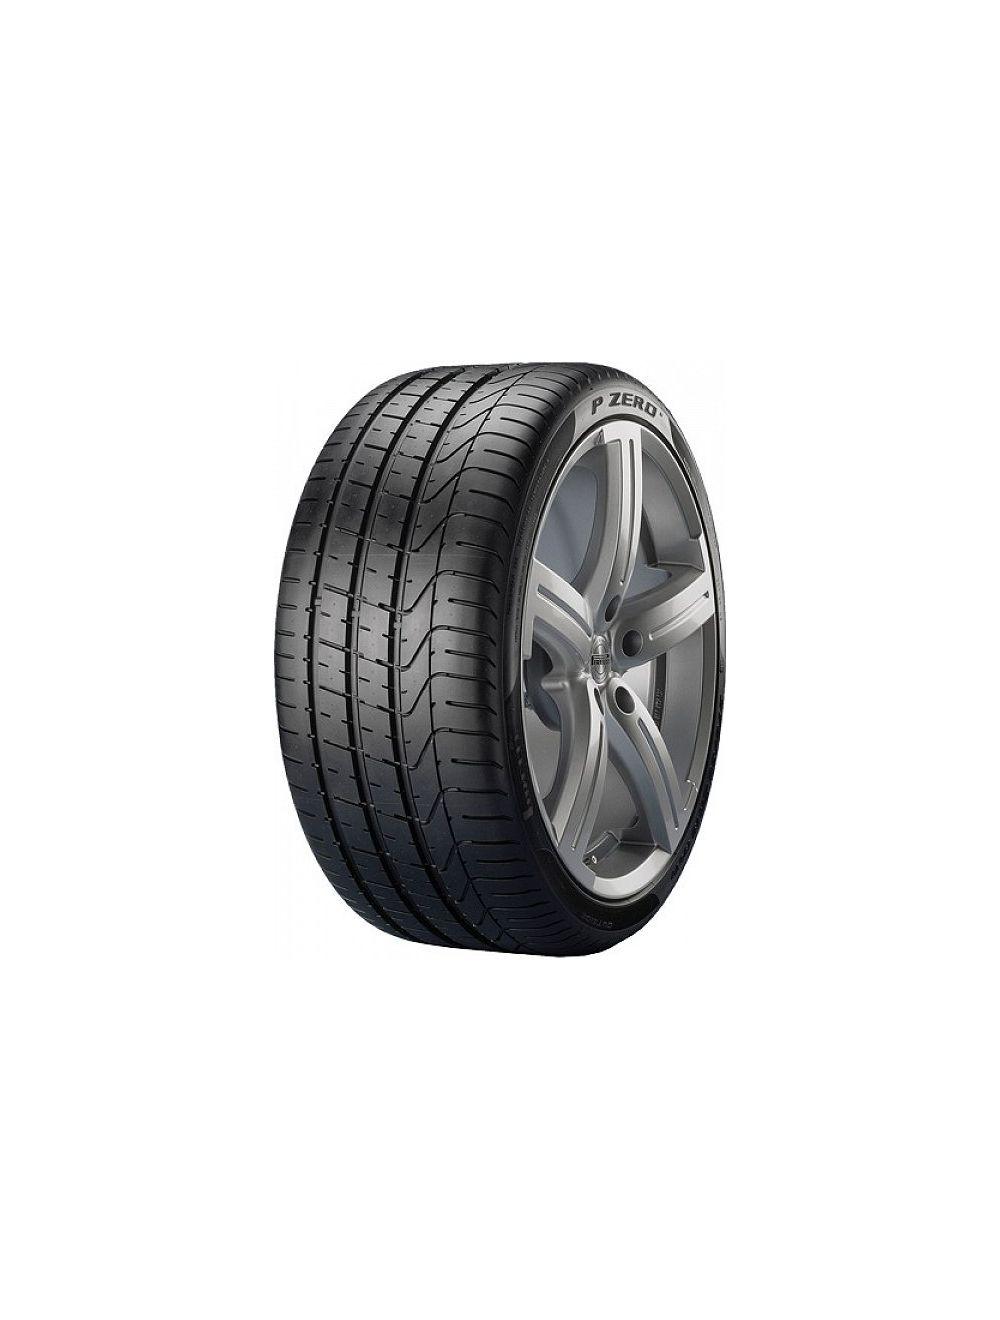 Pirelli 255/40R21 Y PZero RO1 XL Nyári gumi